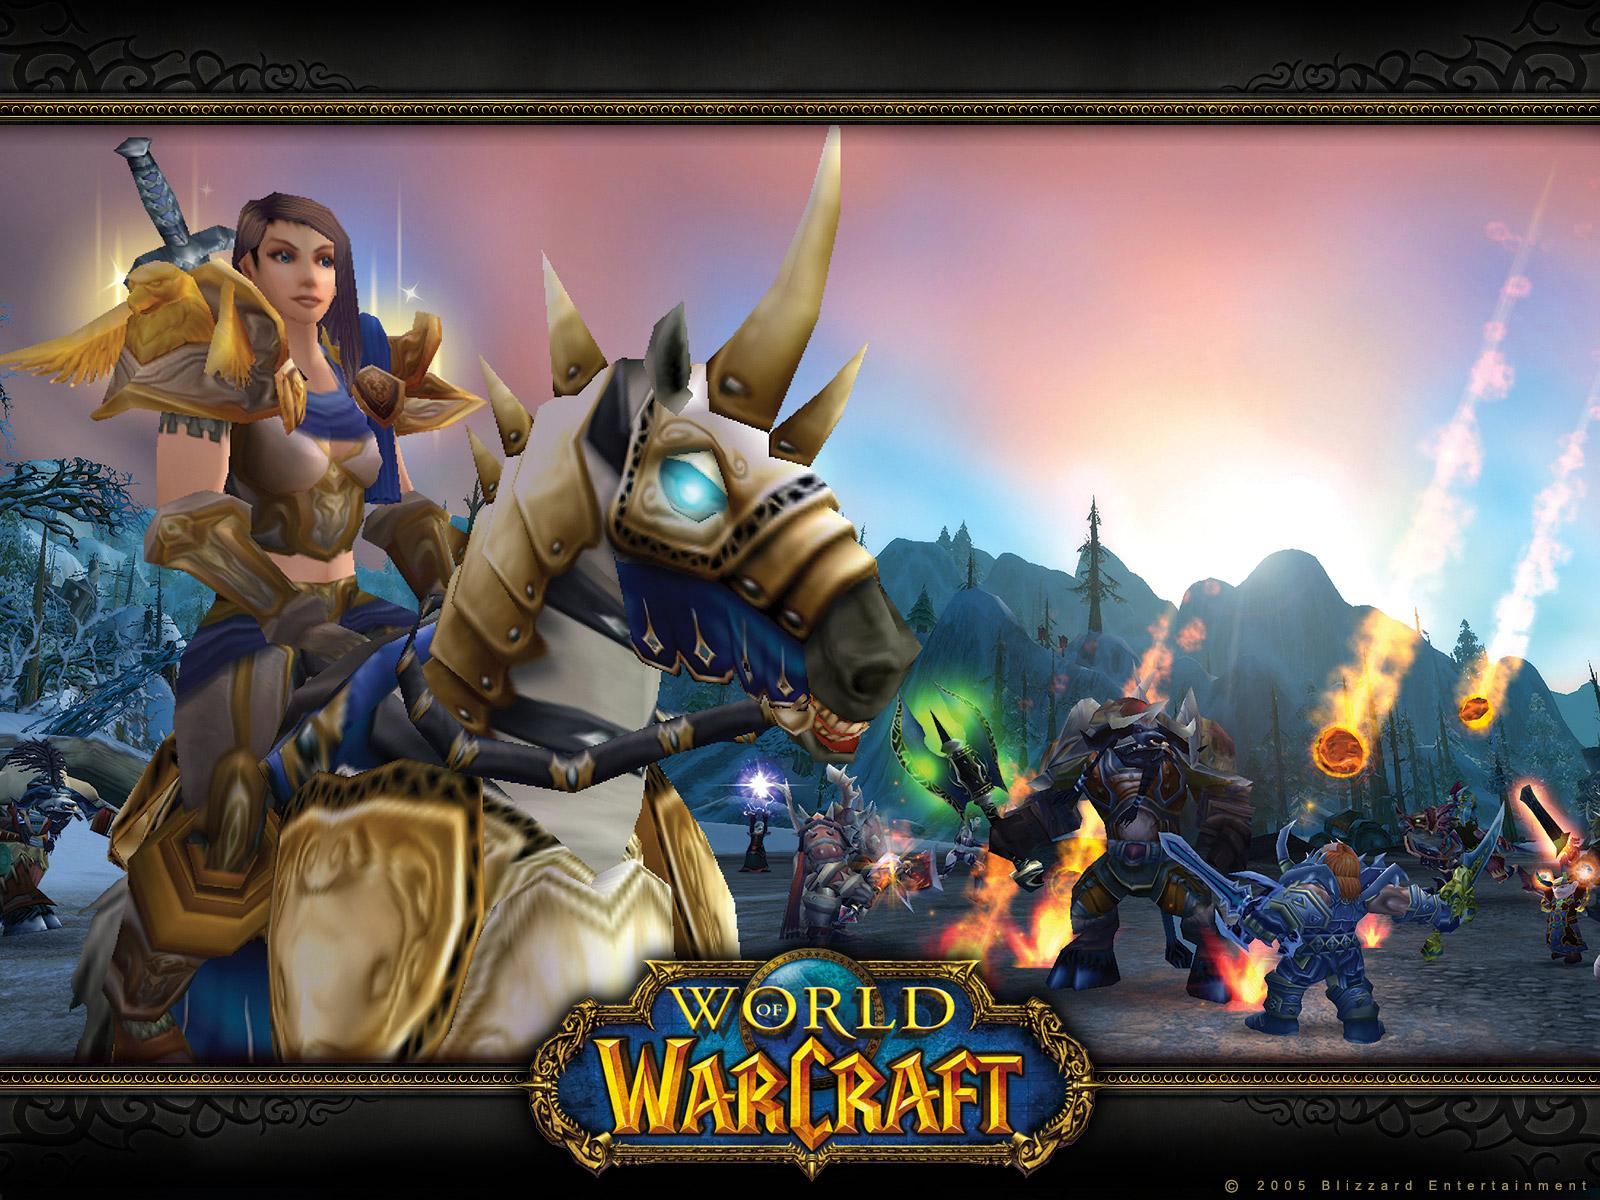 World of warcraft for World of war craft com